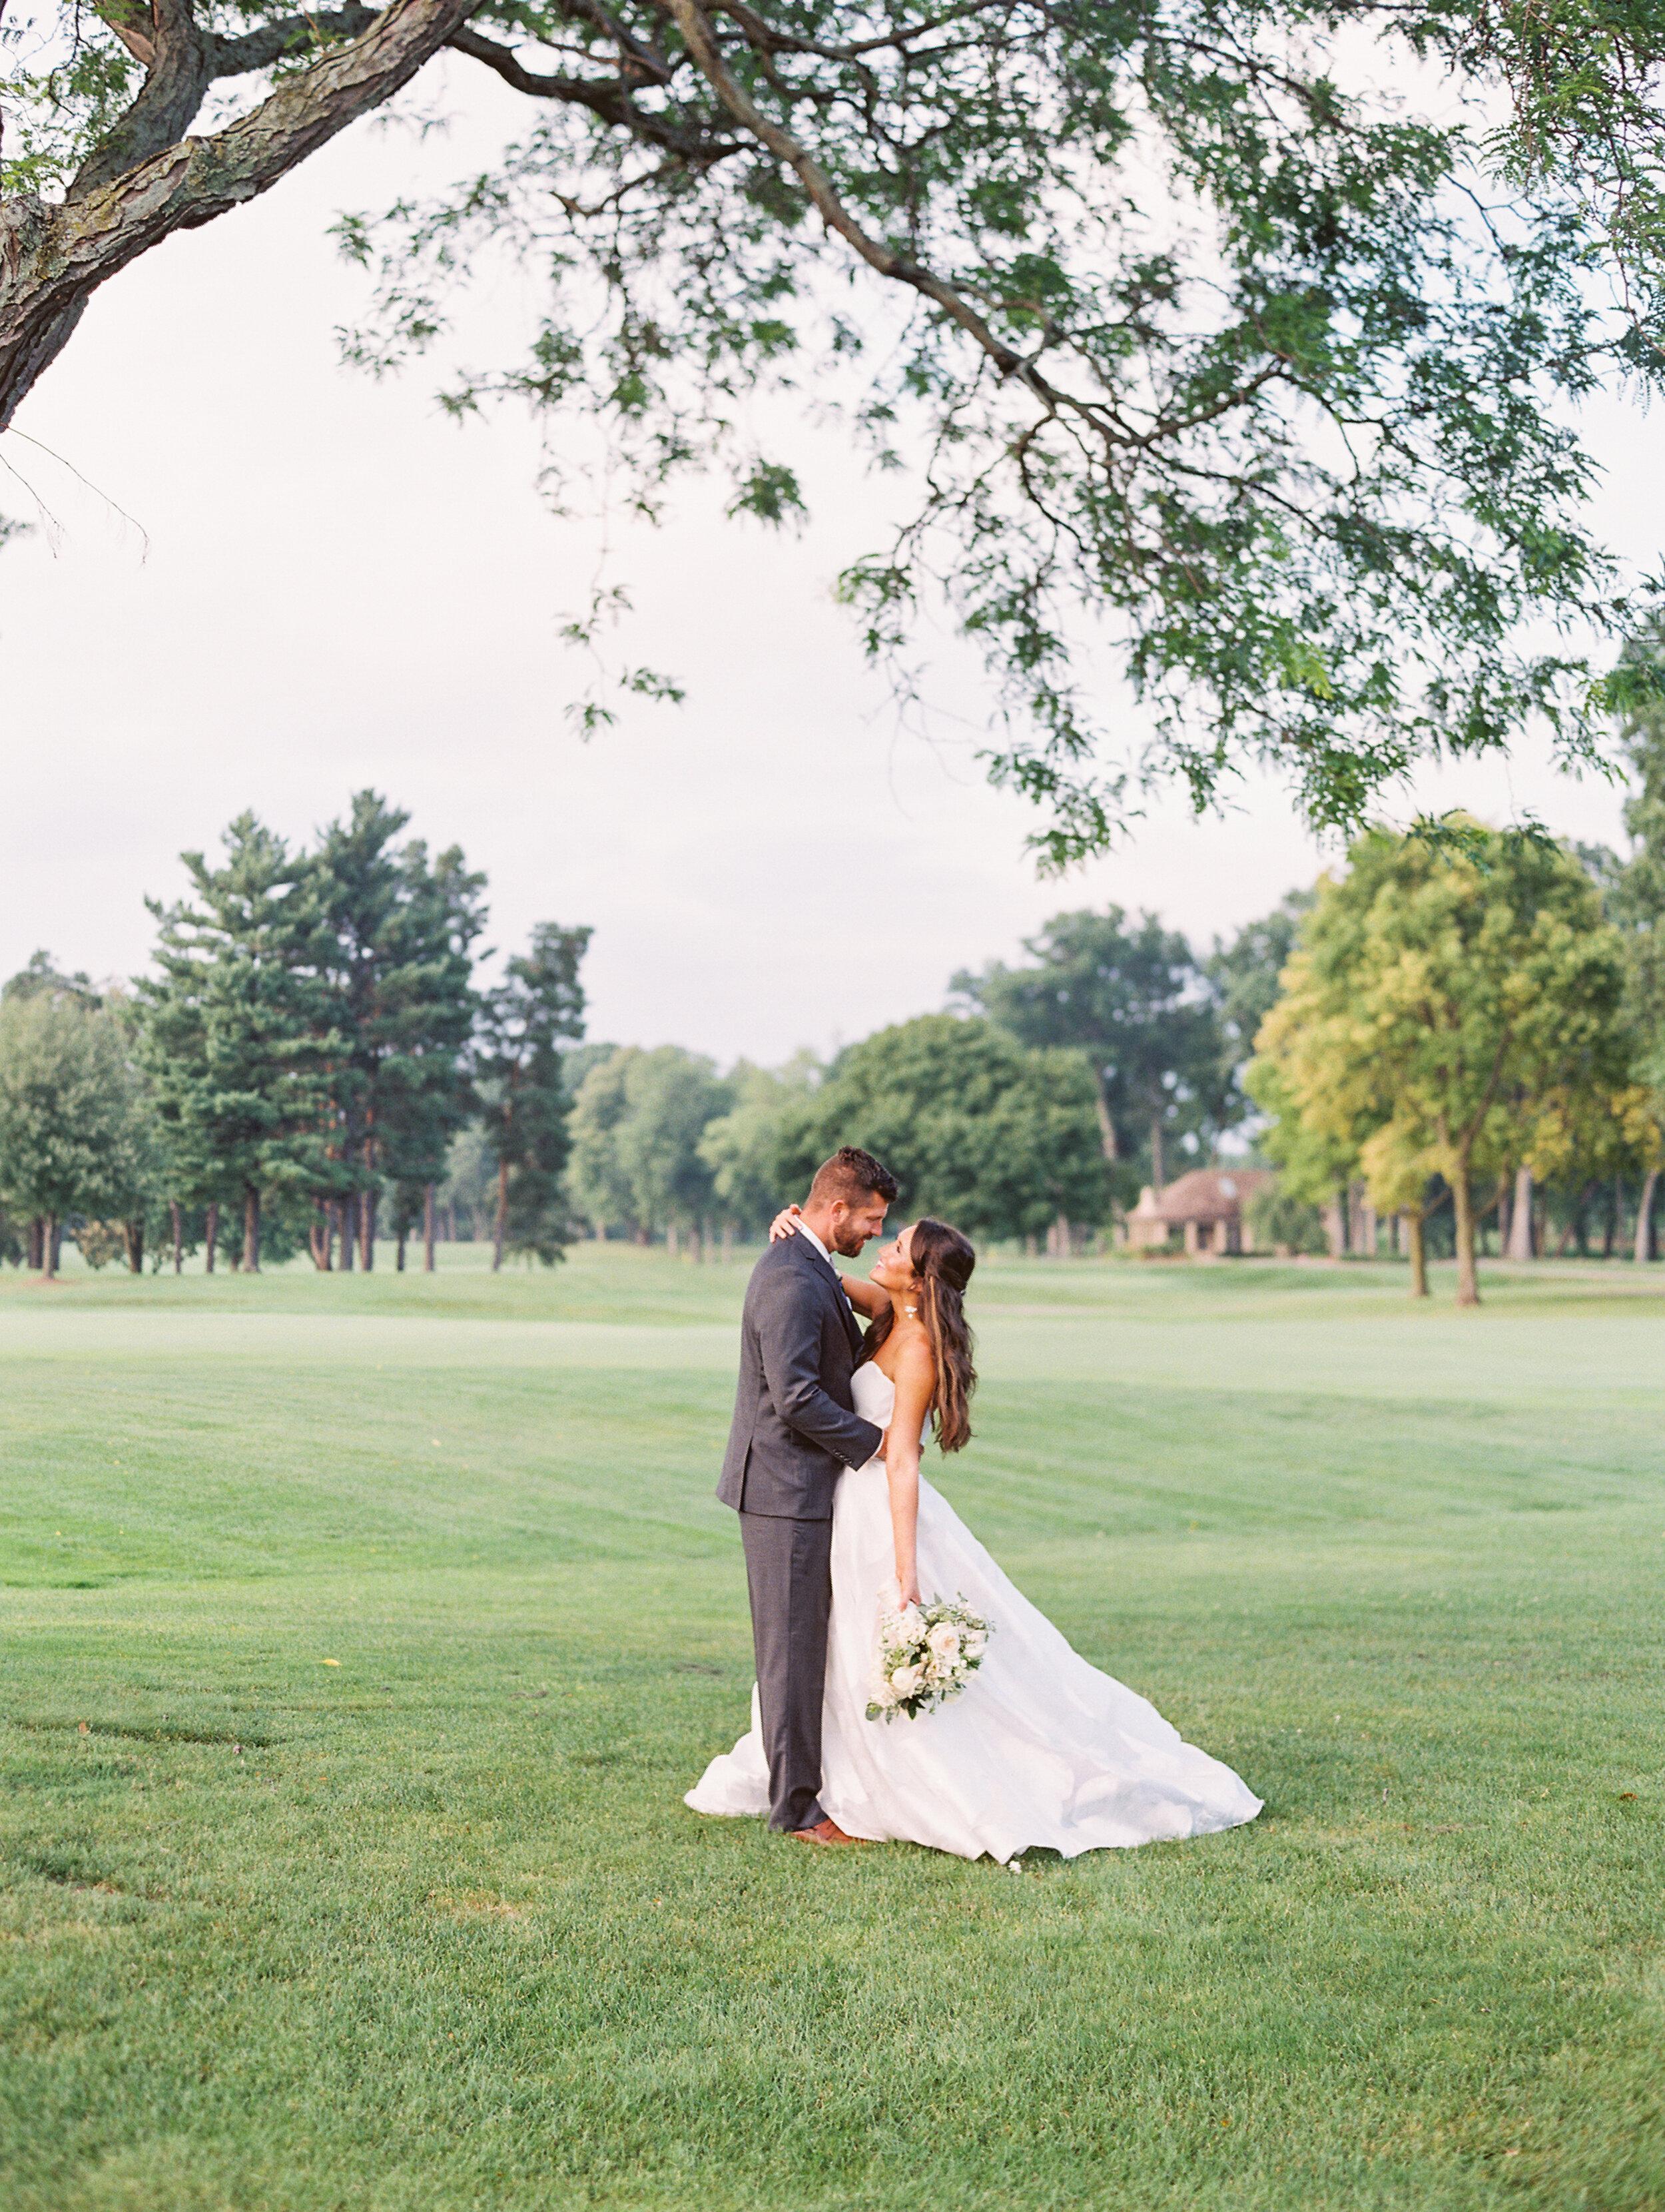 Kuiper+Wedding+Reception+Bridal+Party-169.jpg